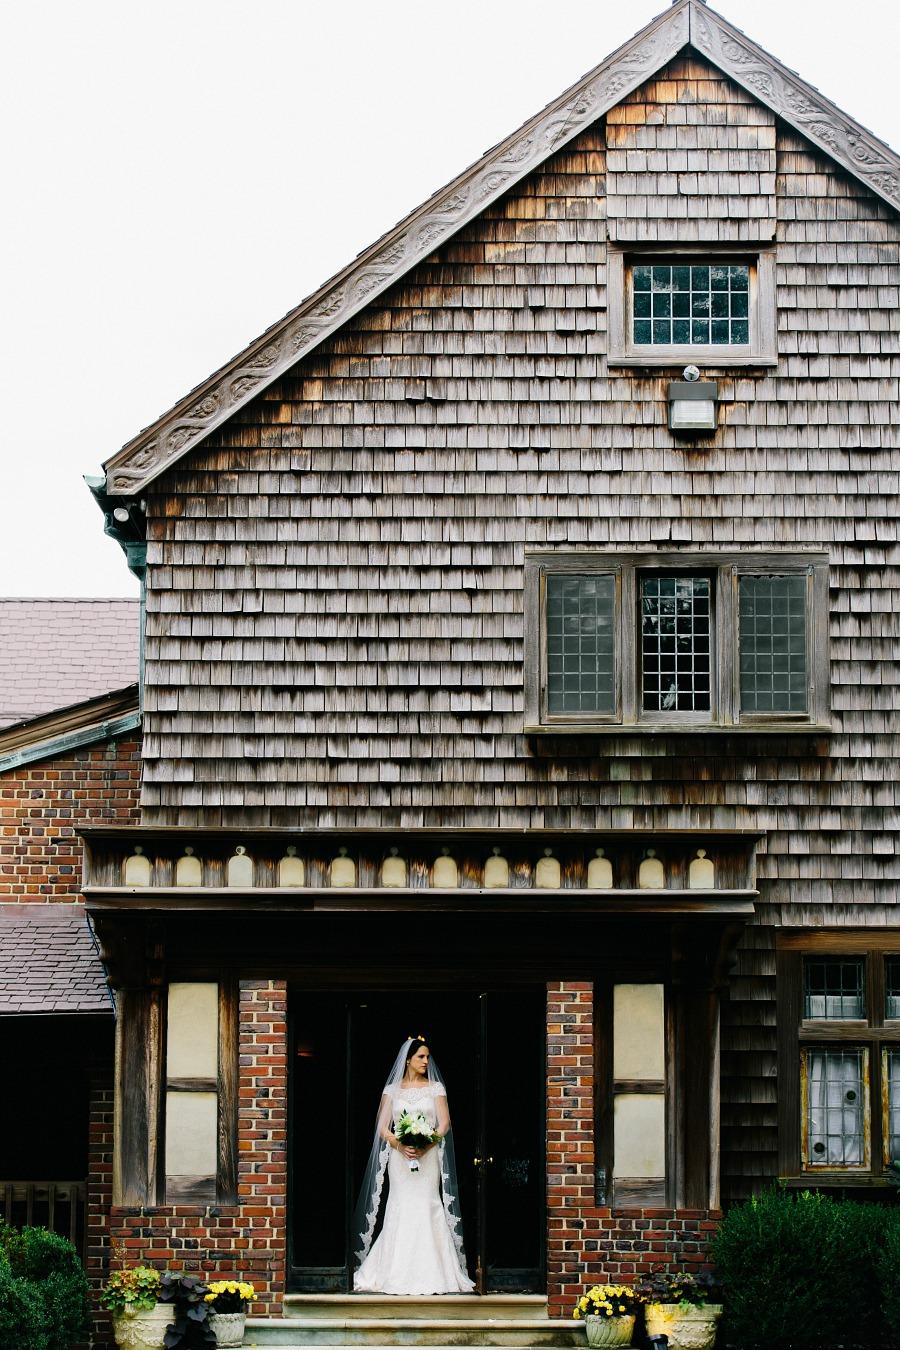 Hermitage Museum & Gardens Wedding Photographer in Norfolk, VA